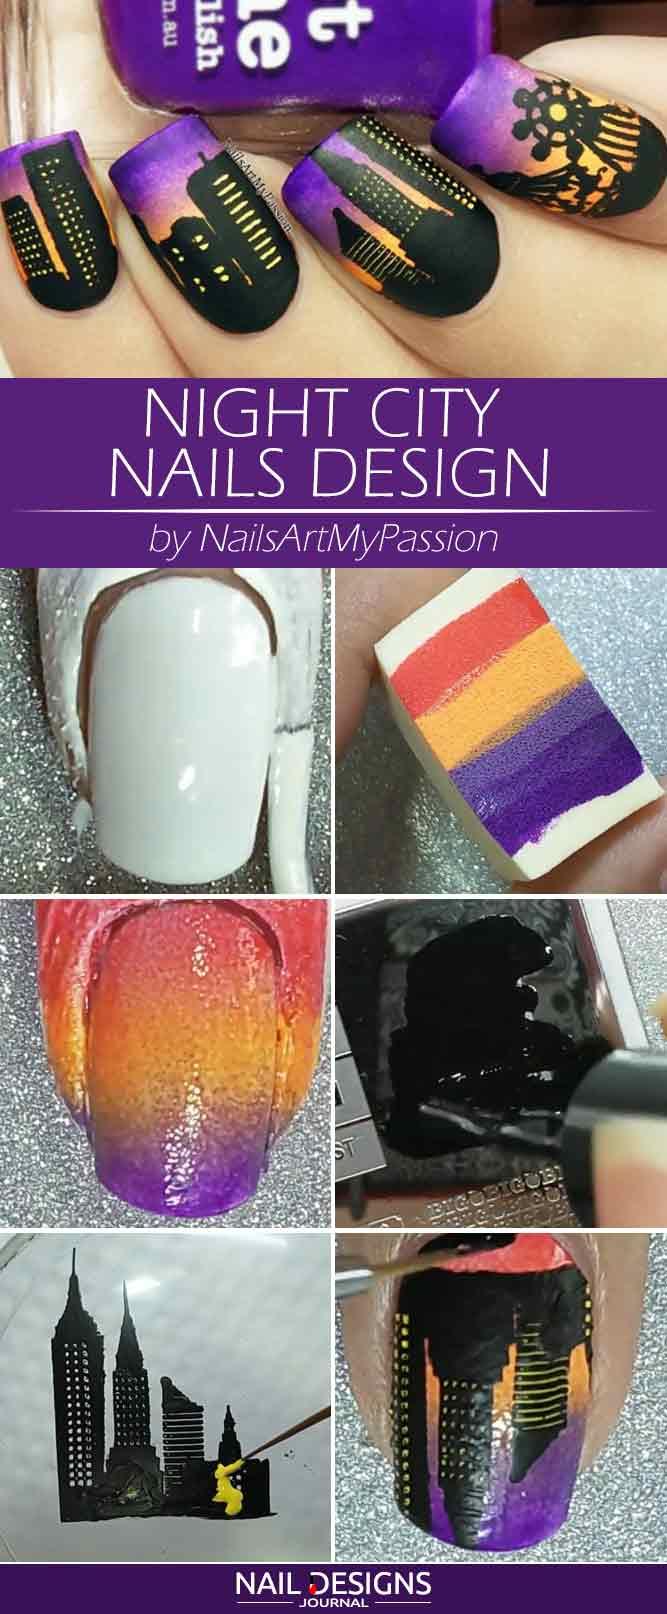 Night City Nails Design